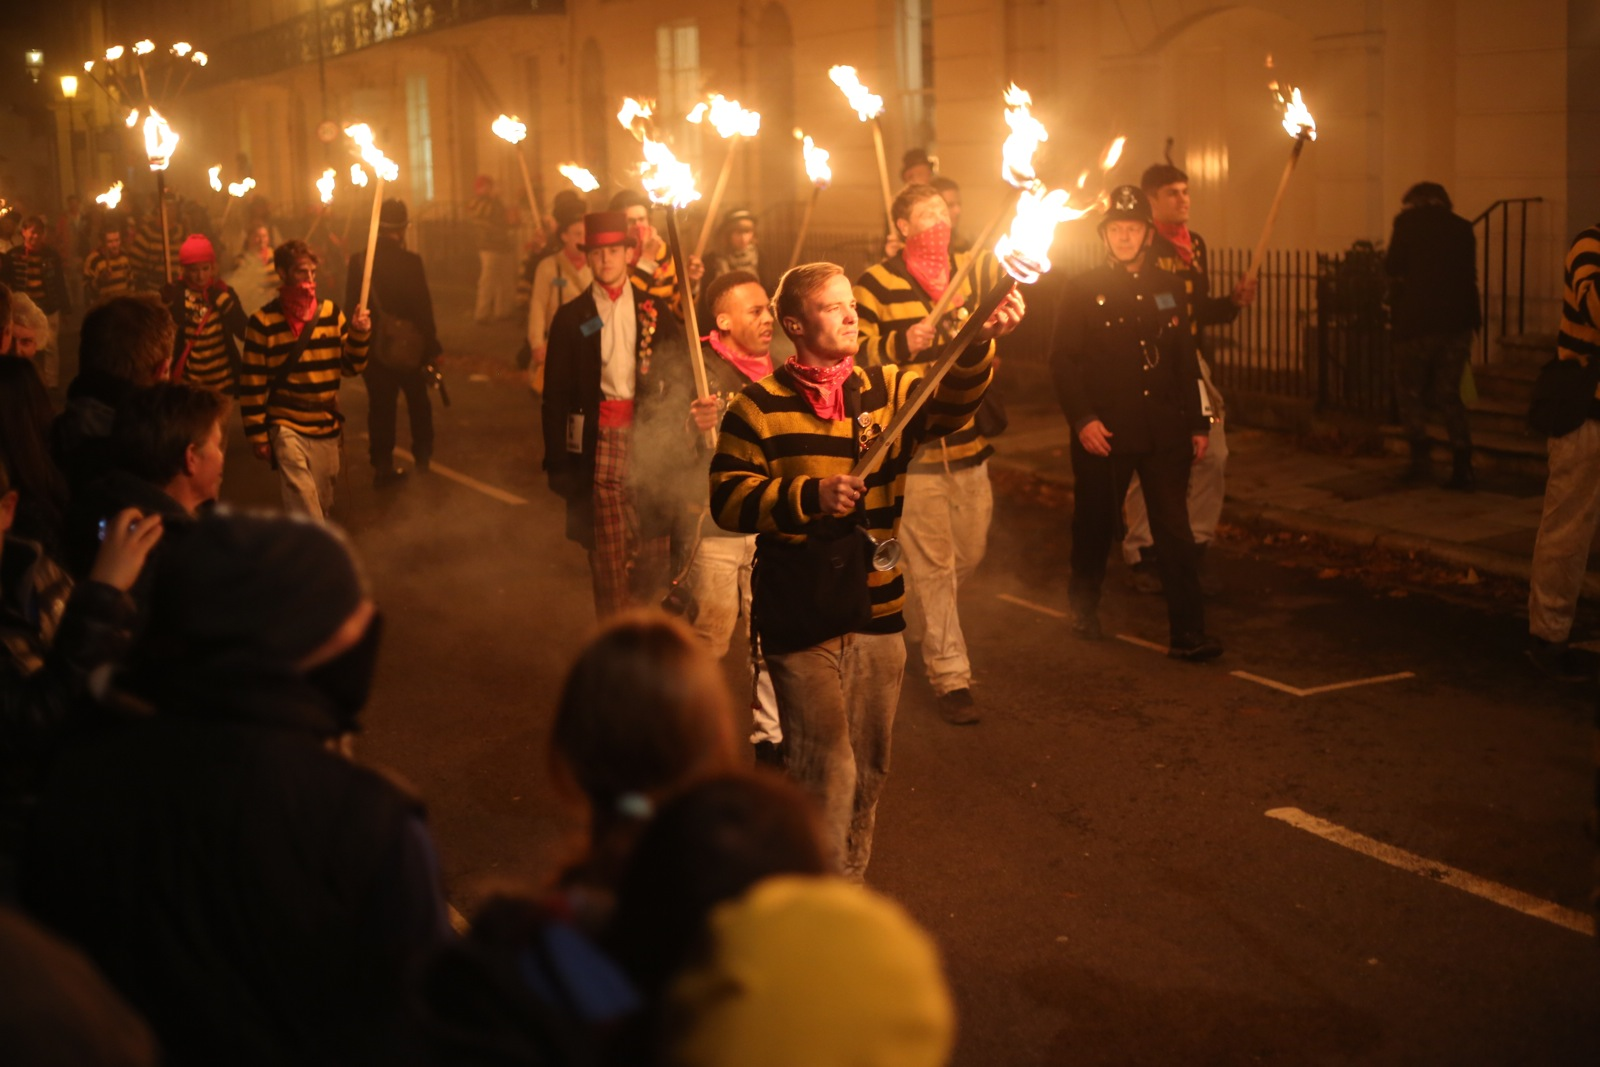 Lewes Bonfire Night Mediacsc Photo Cc Httpflic.Krphicoom   09